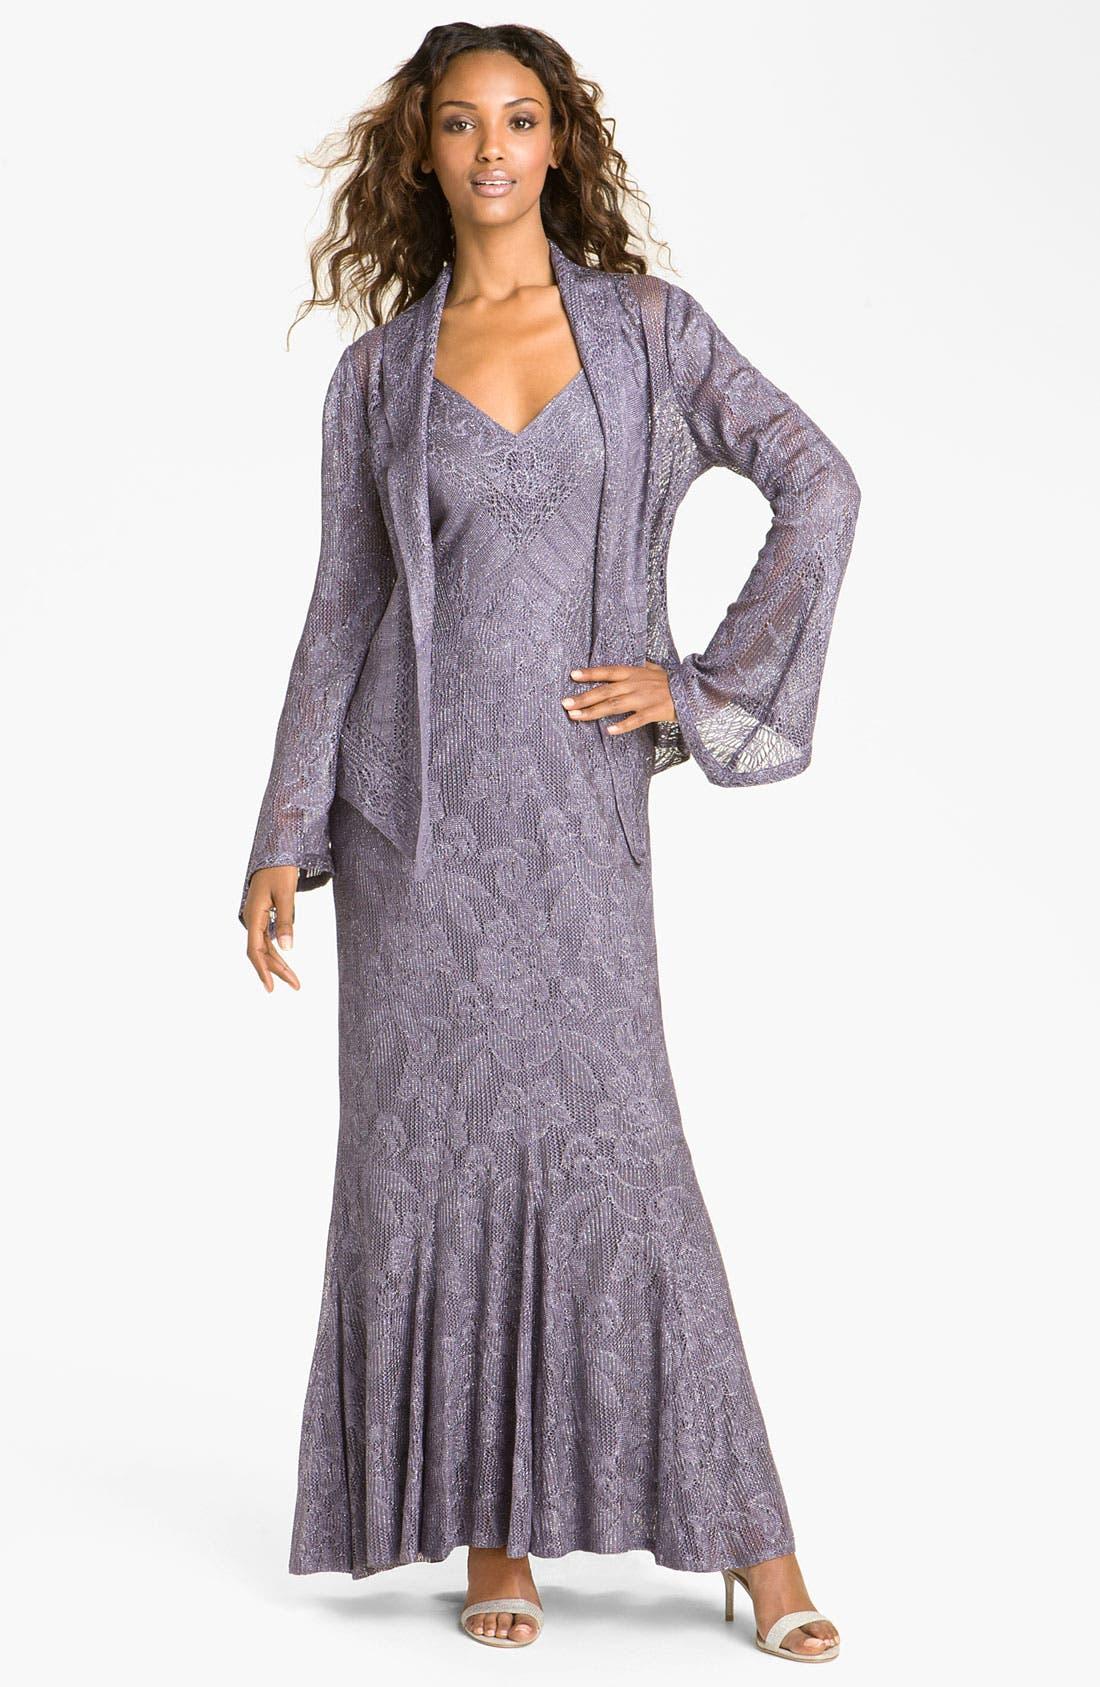 Main Image - Damianou Metallic Knit Gown & Jacket